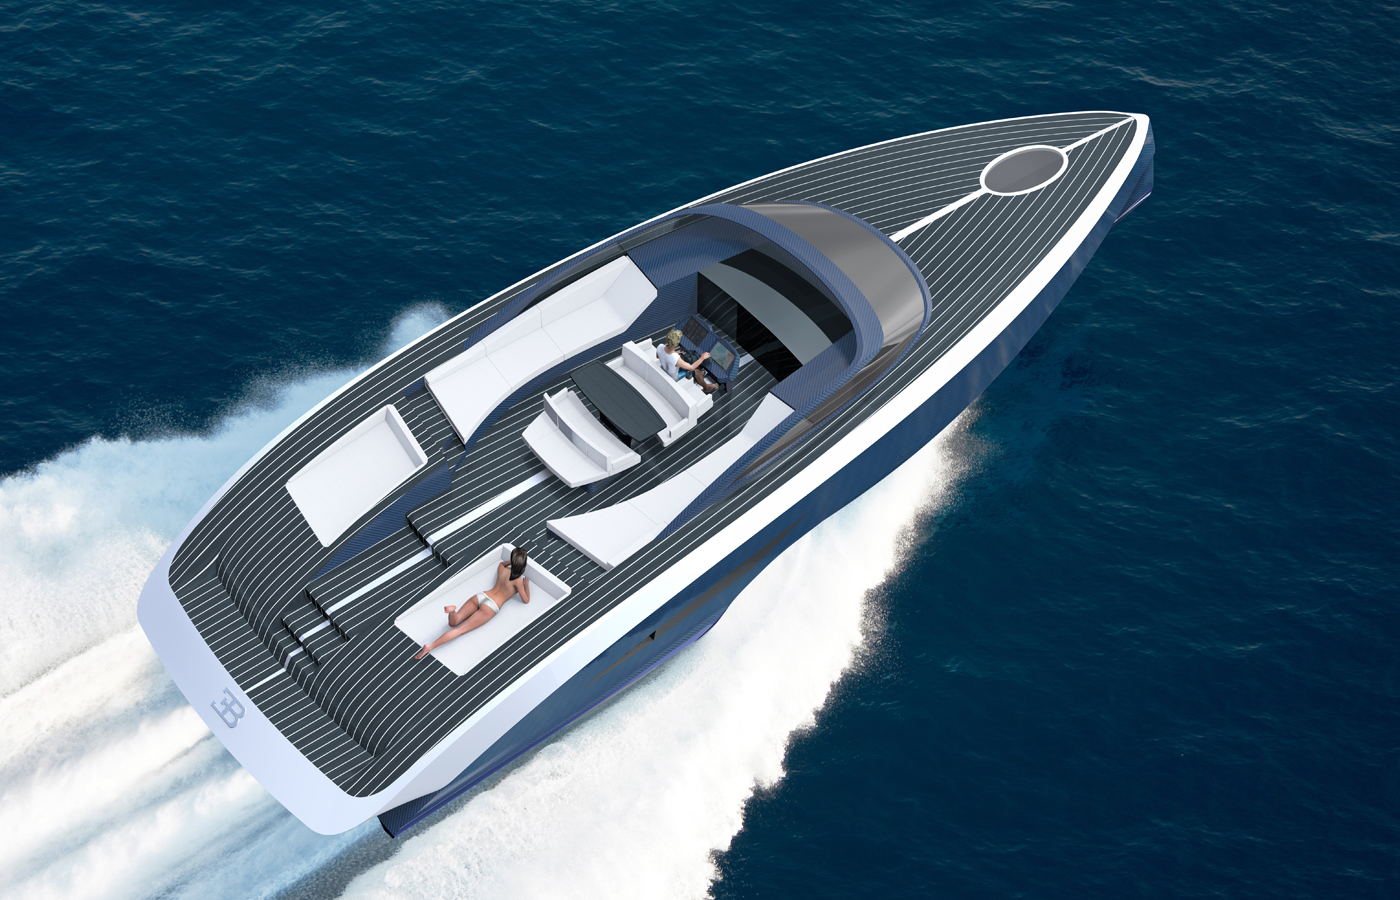 luxus-yacht motor-yacht carbon-yacht yacht